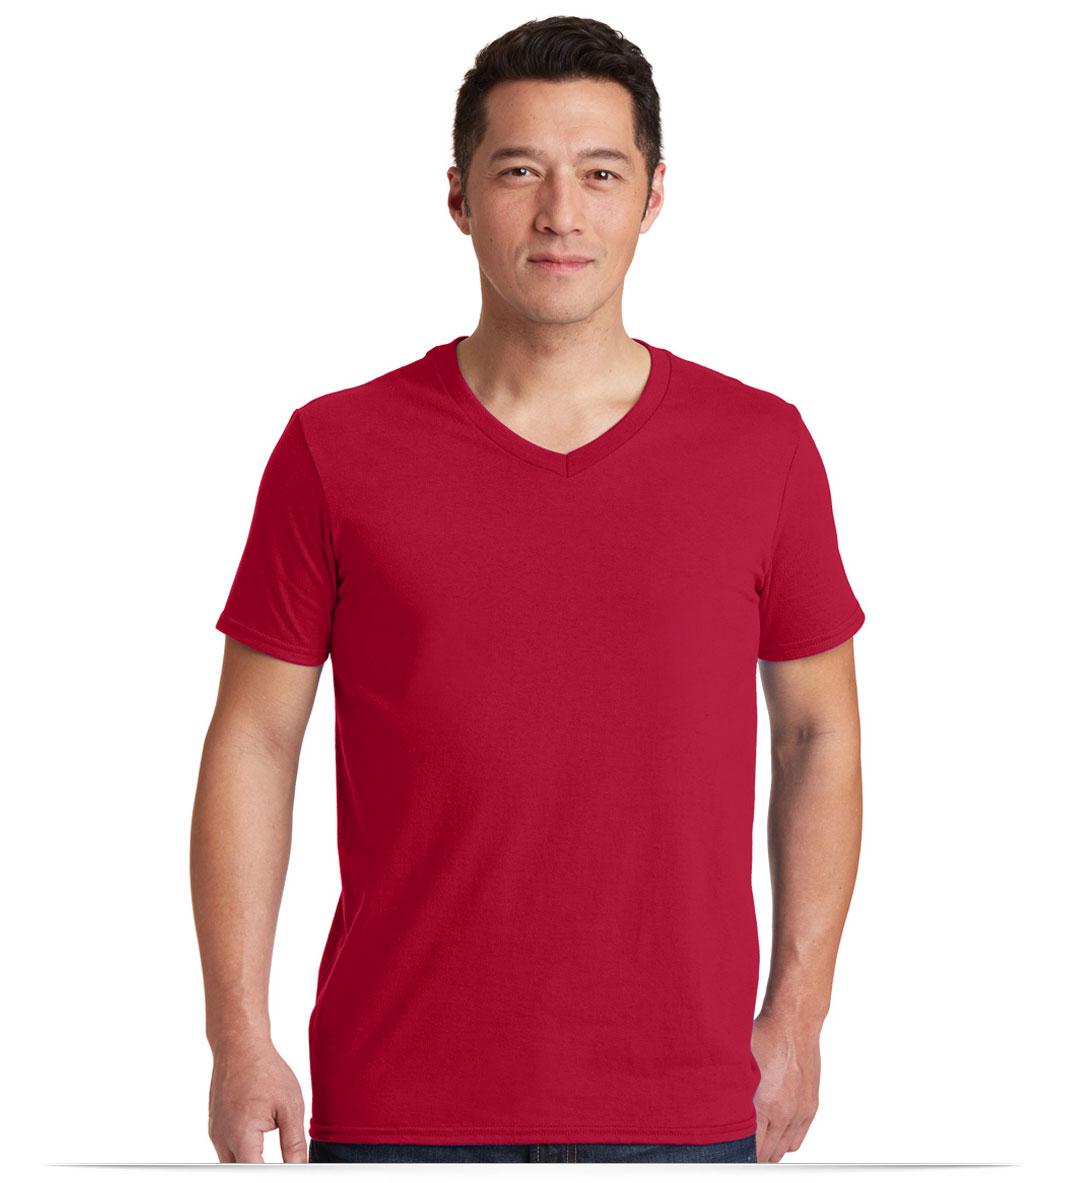 Personalized Logo Gildan V-Neck T-Shirt